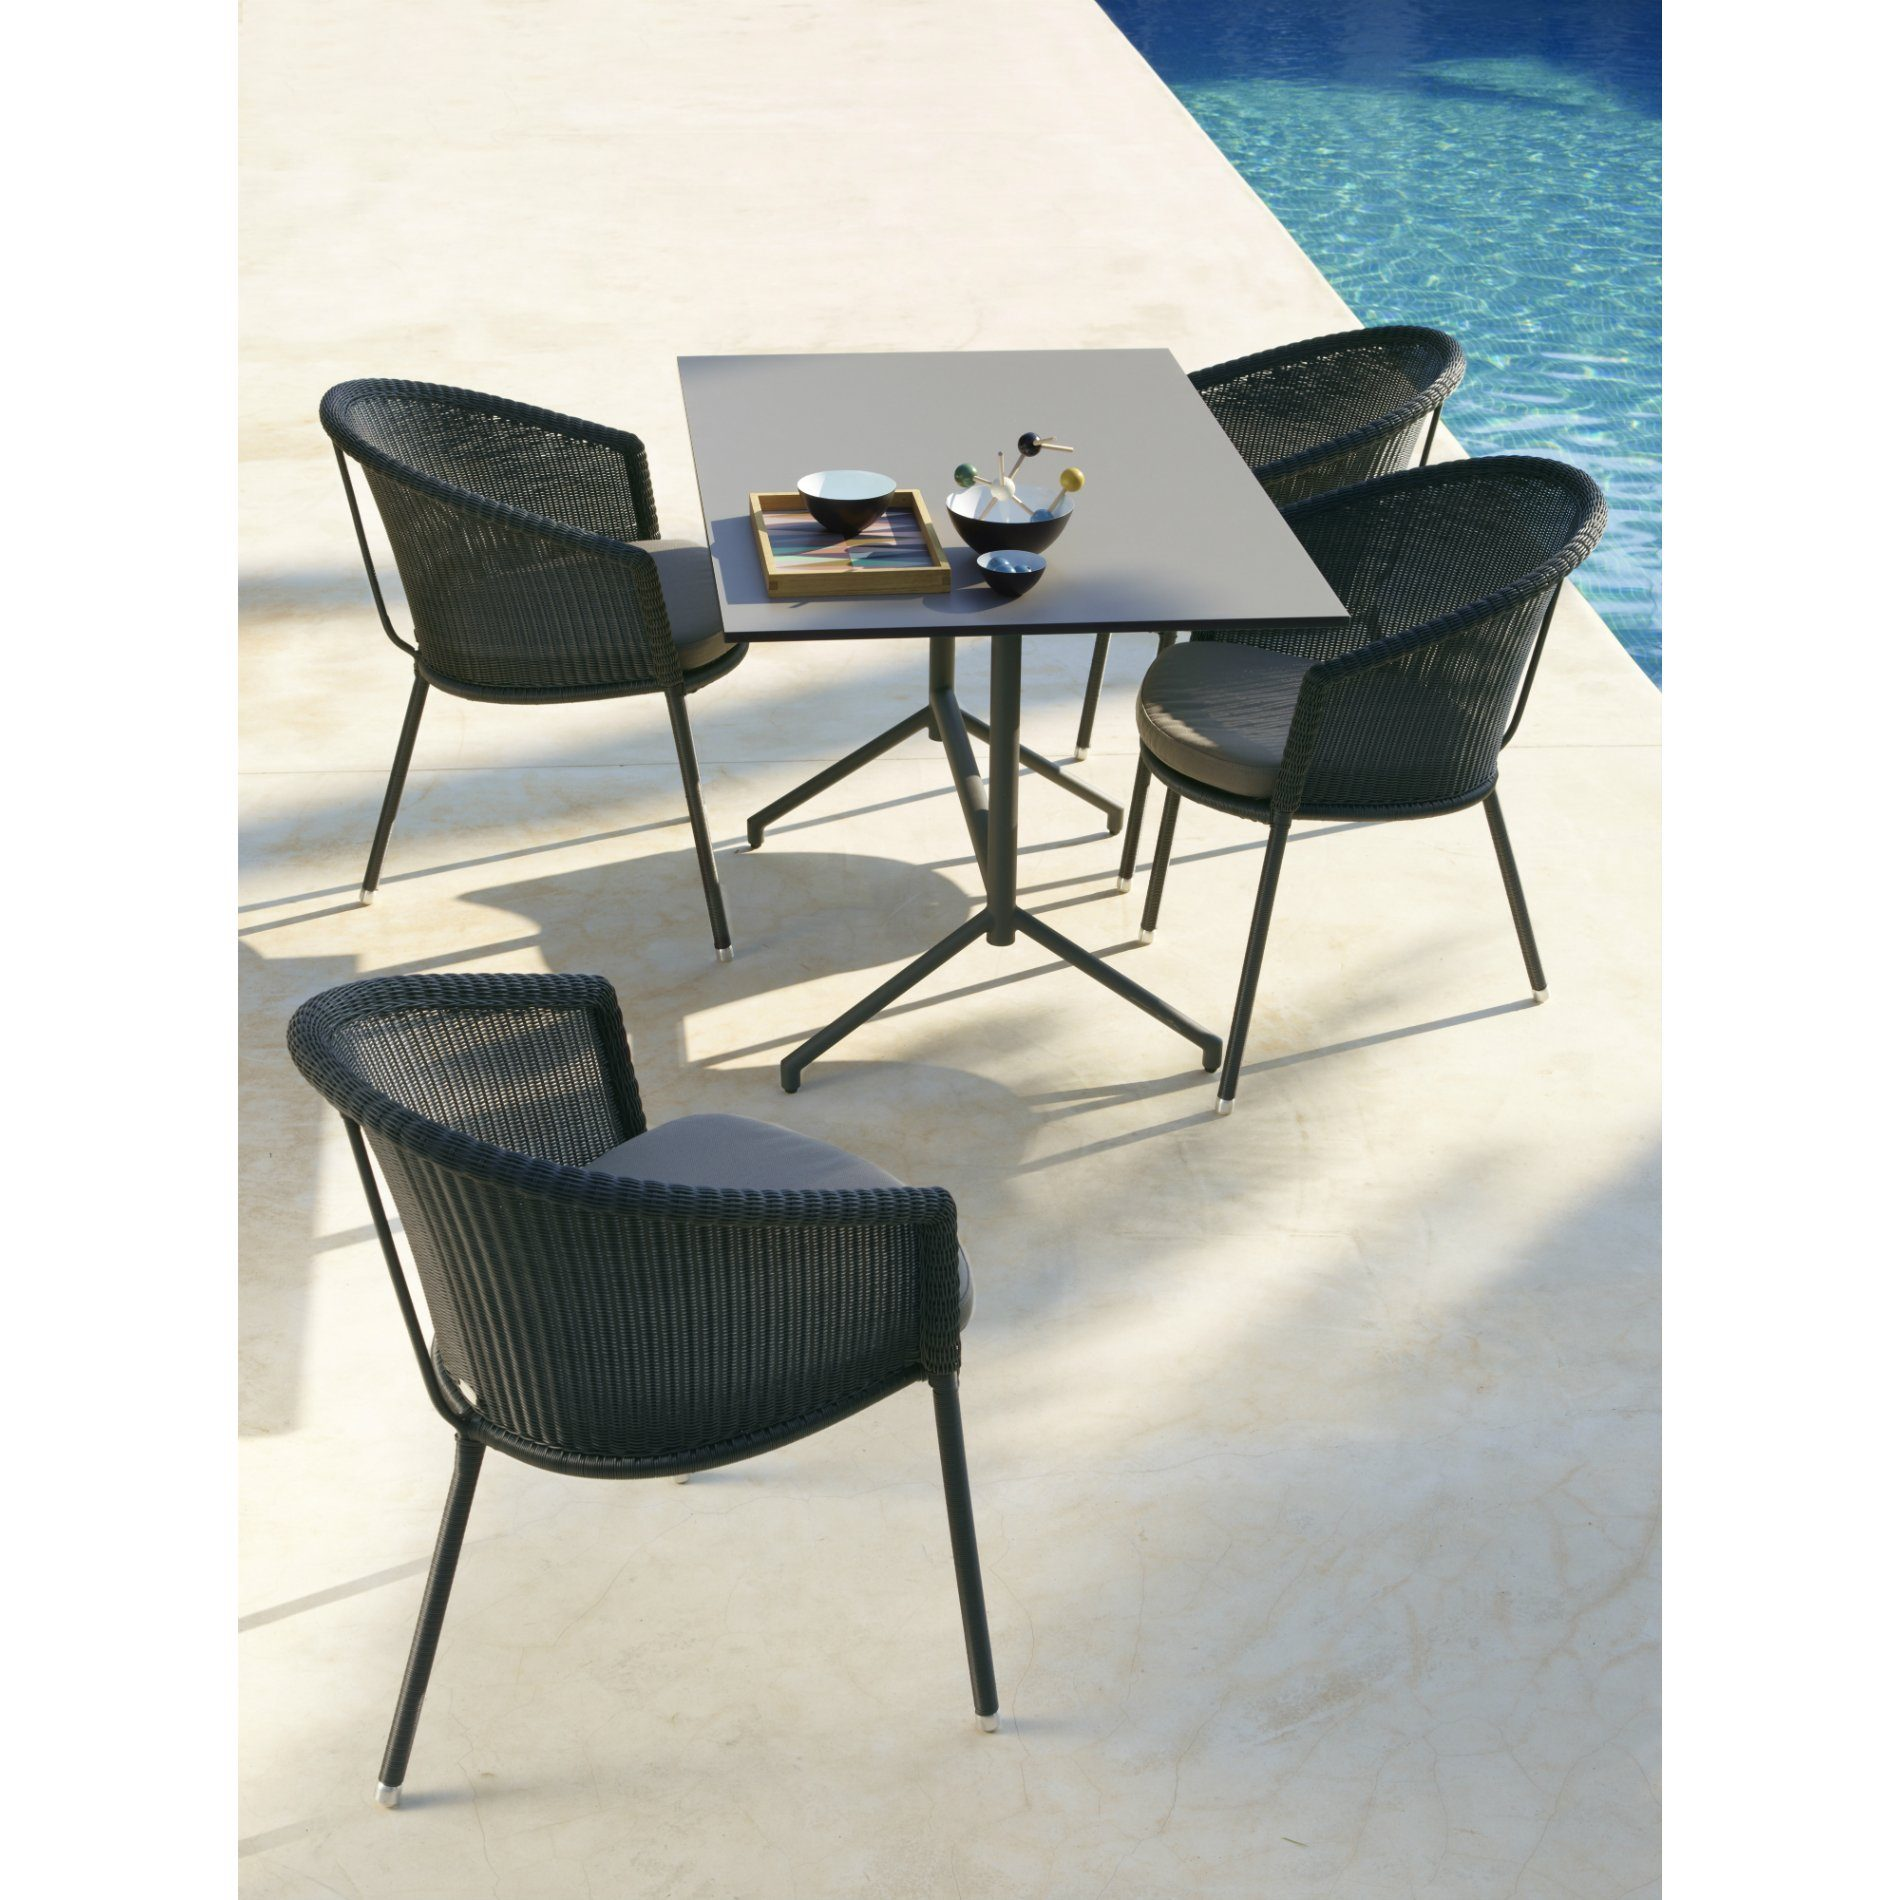 cane line avenue gartentisch rechteckig gestell aluminium. Black Bedroom Furniture Sets. Home Design Ideas